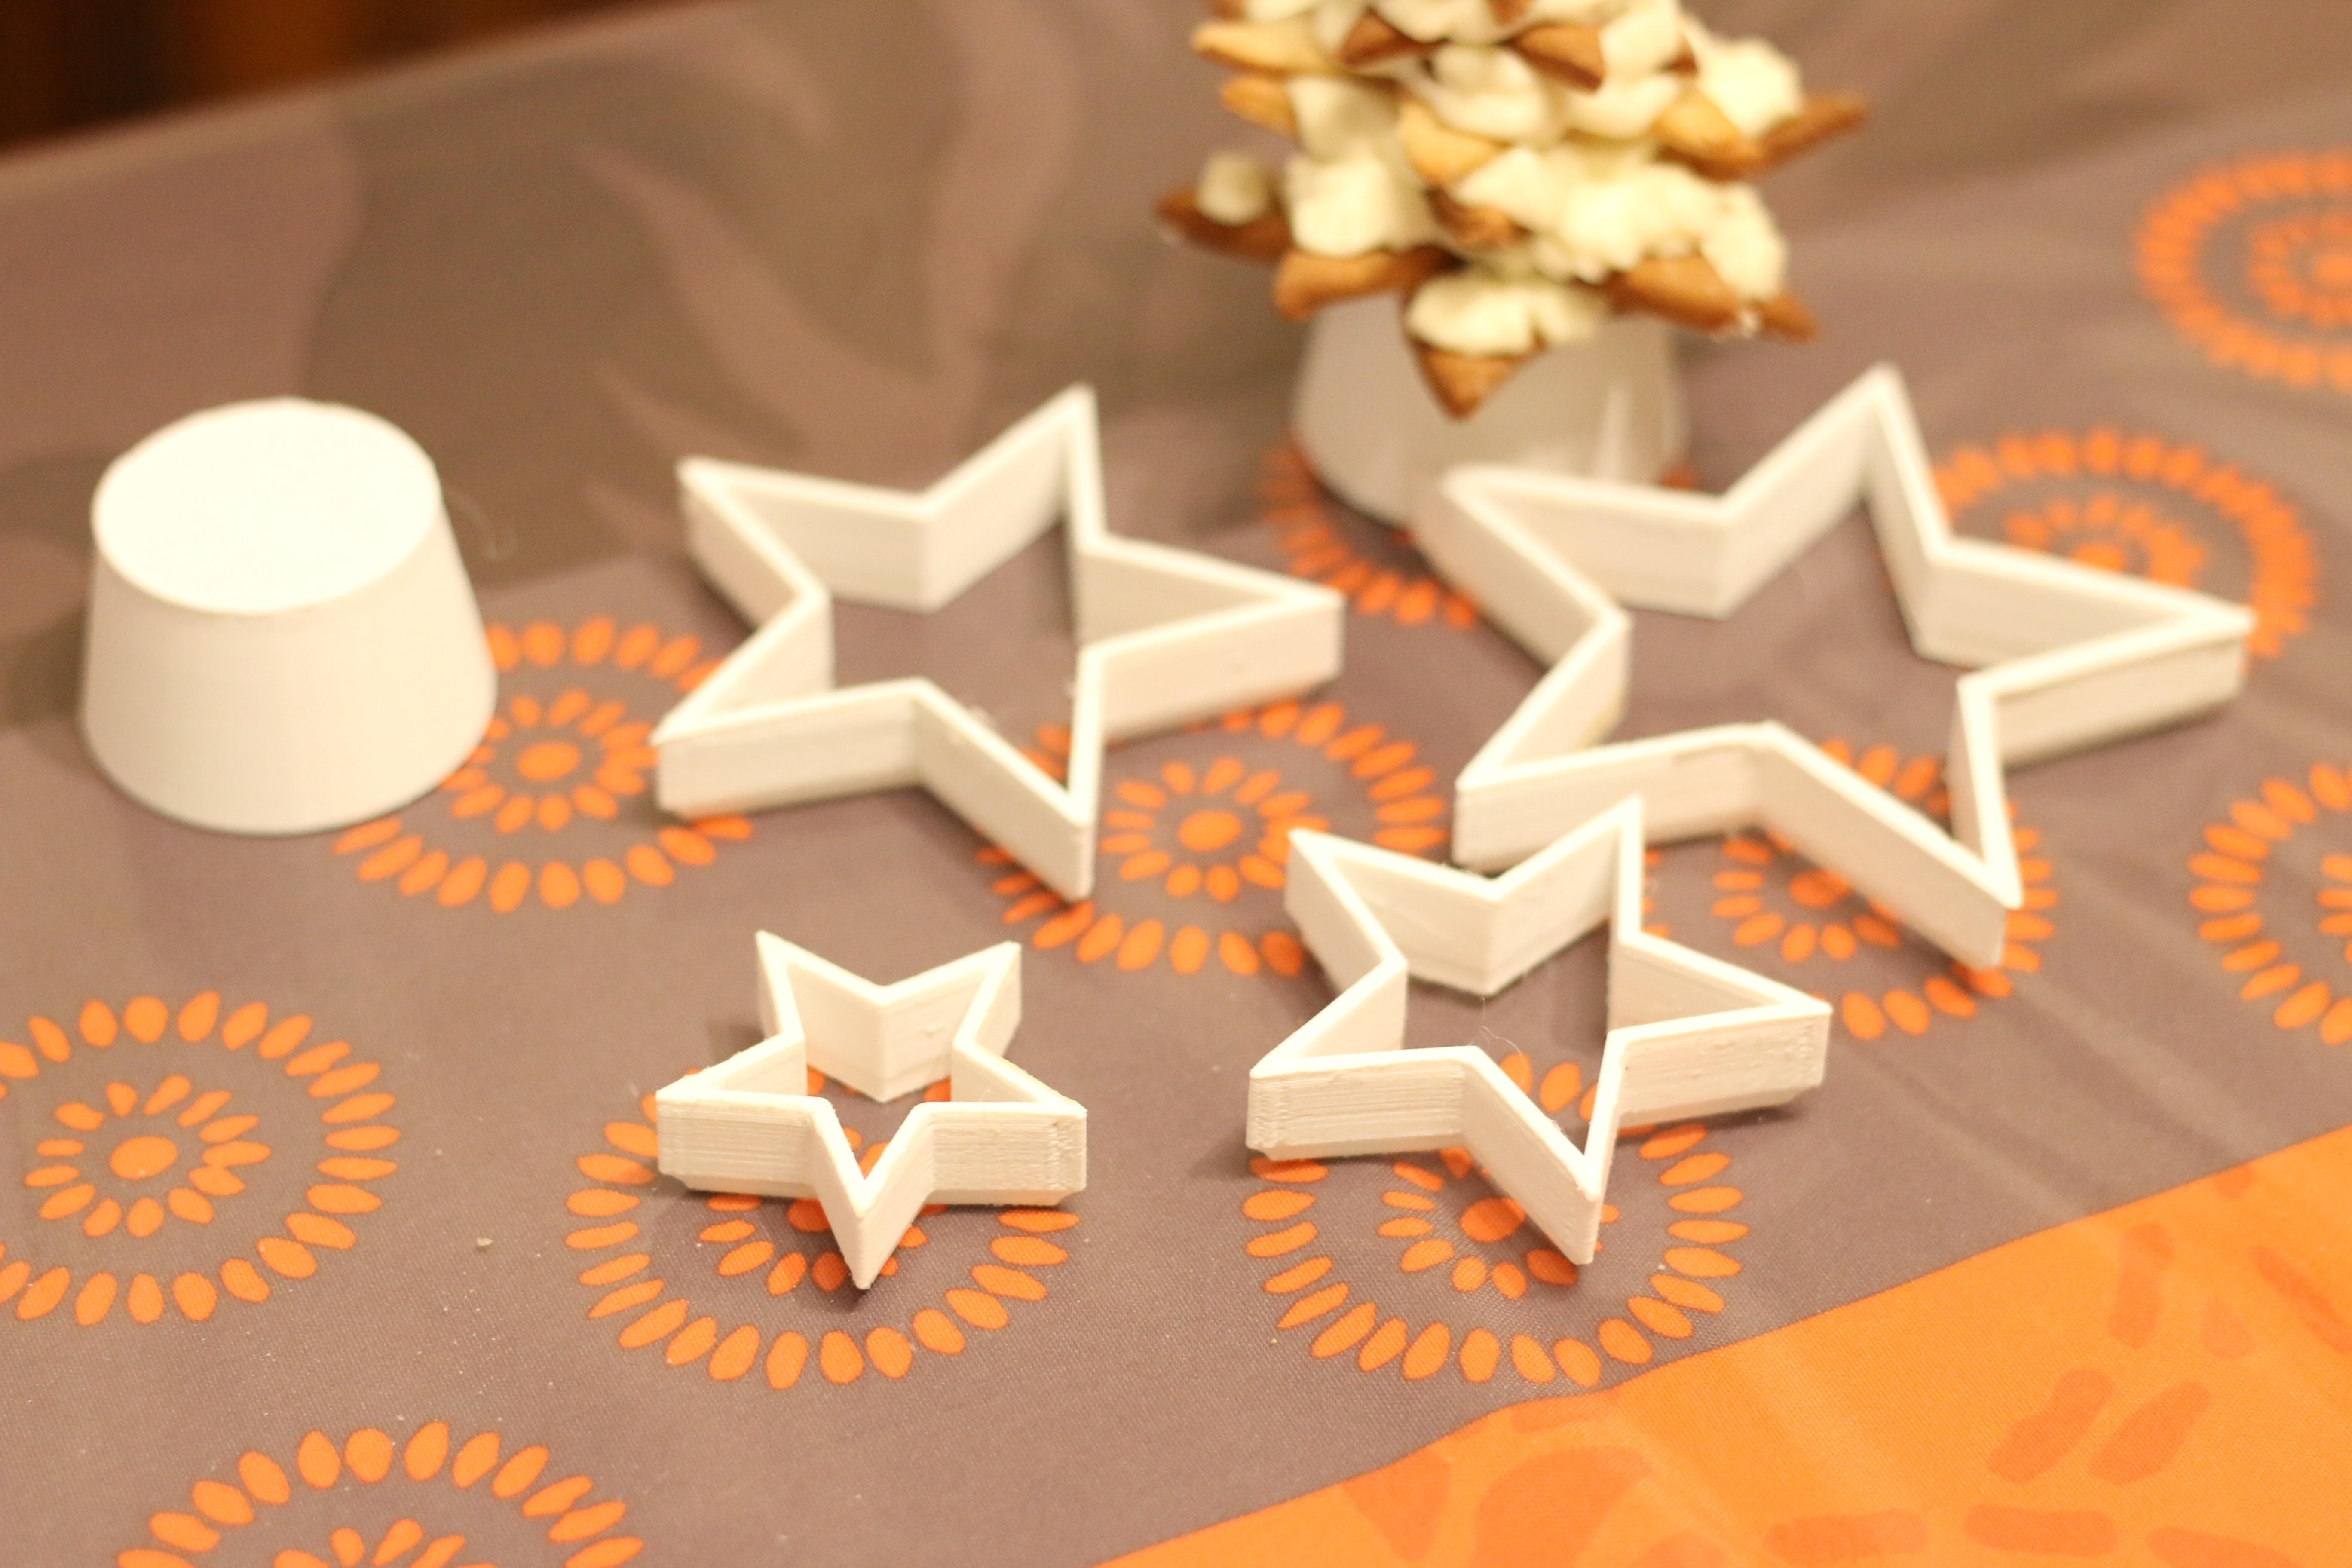 IMG_2270.JPG Download free STL file Empores star parts and pastry rack • 3D printer design, DMS88